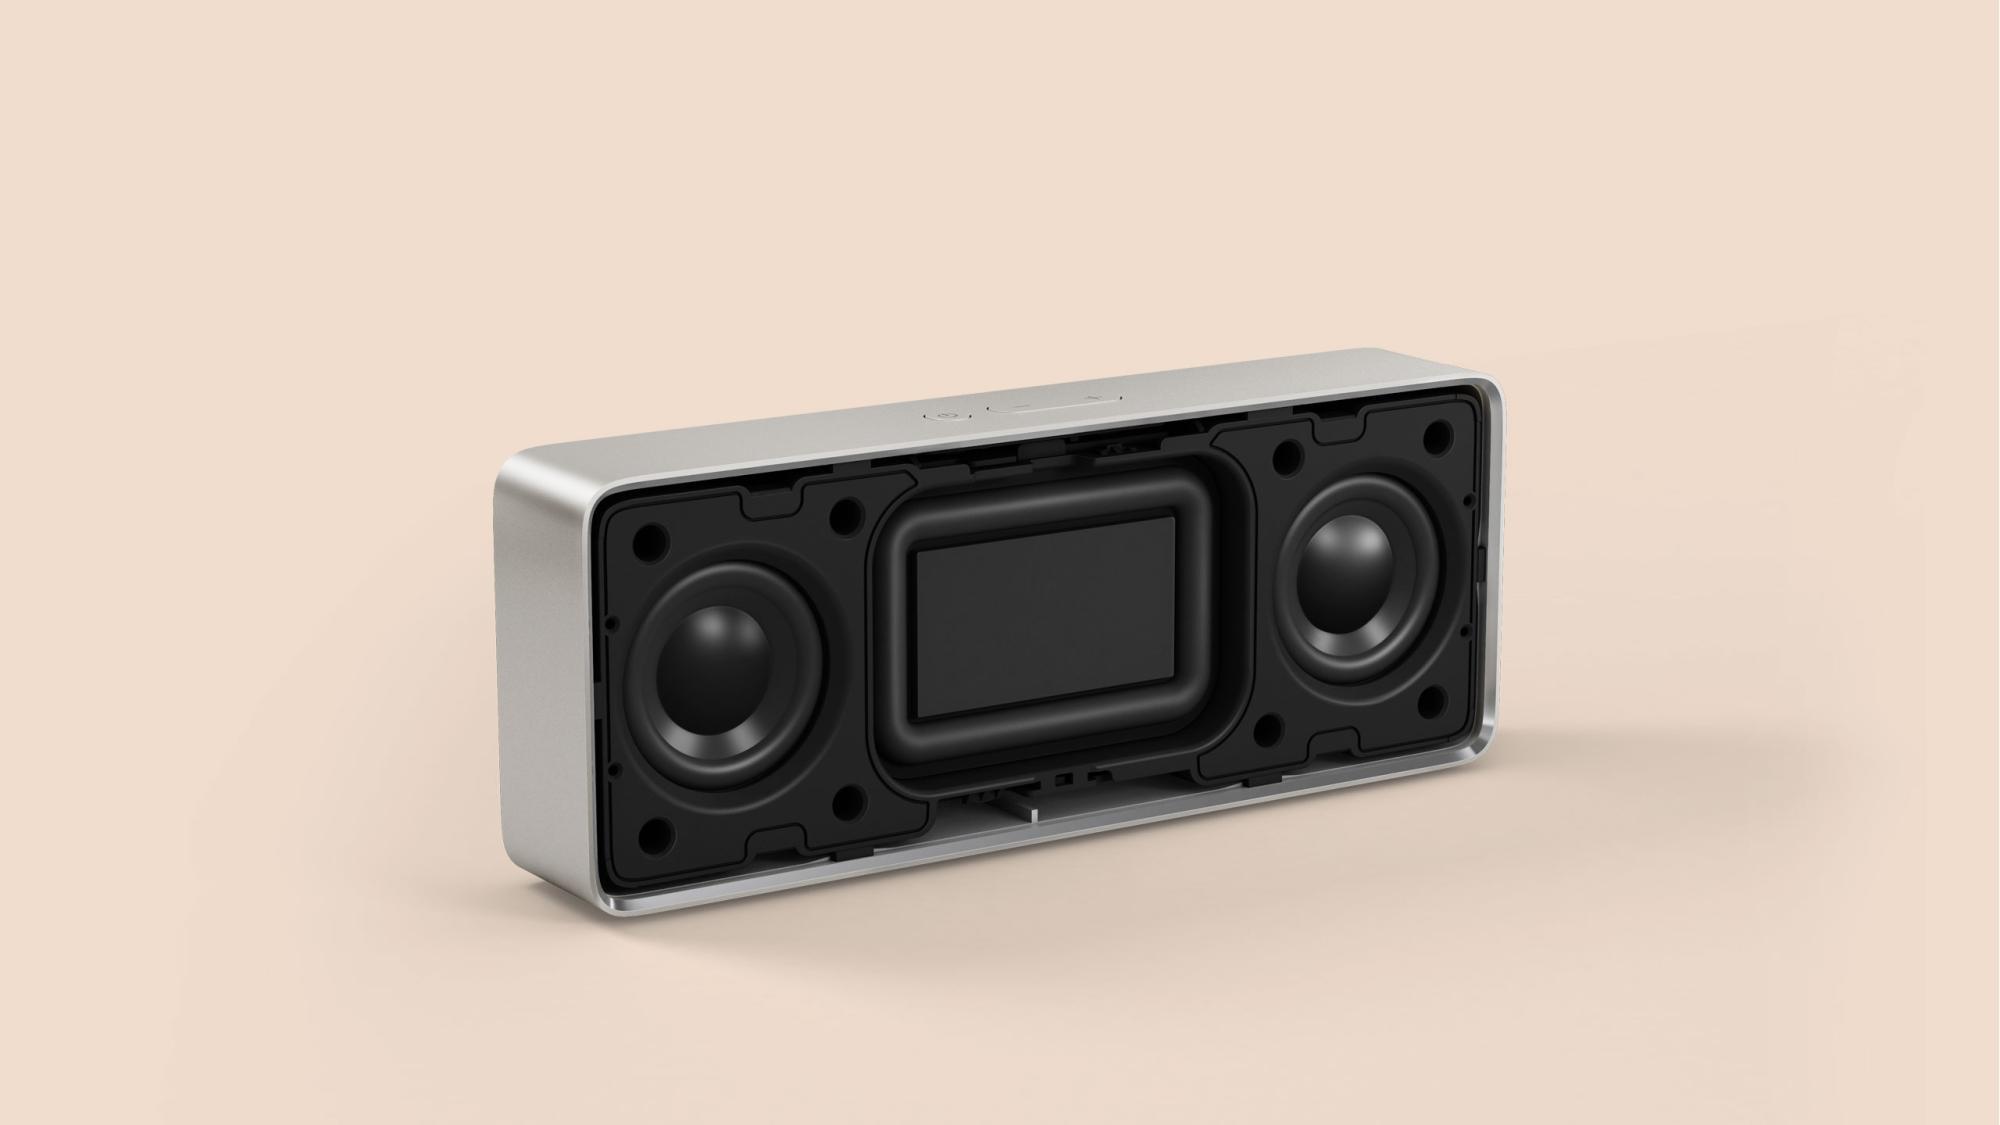 xiaomi square box bluetooth lautsprecher 2. Black Bedroom Furniture Sets. Home Design Ideas